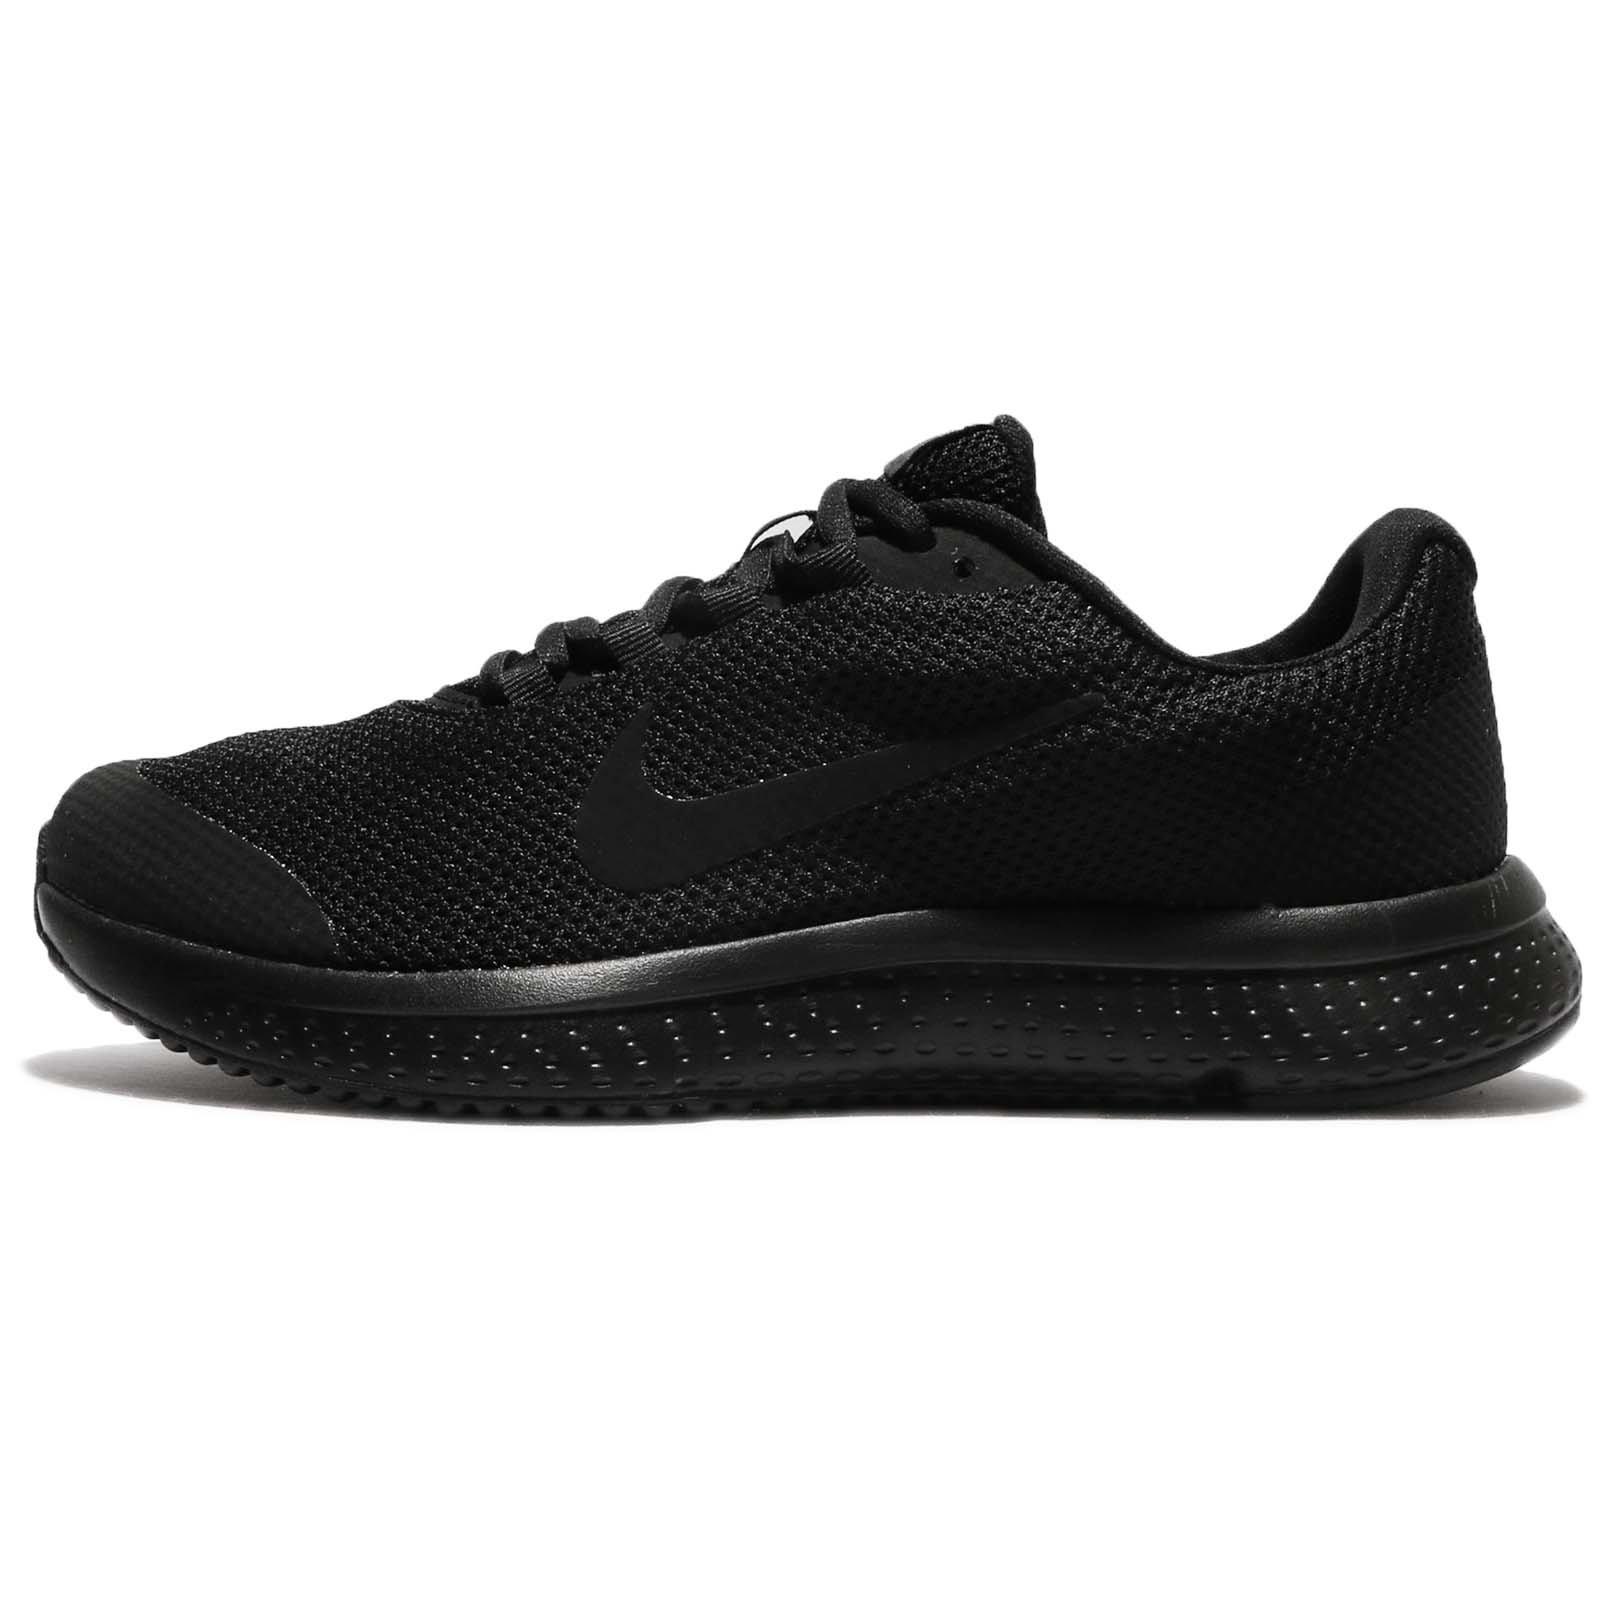 NIKE Women's Runallday Running Shoe (8 B(M) US, Black/Black/Anthracite)